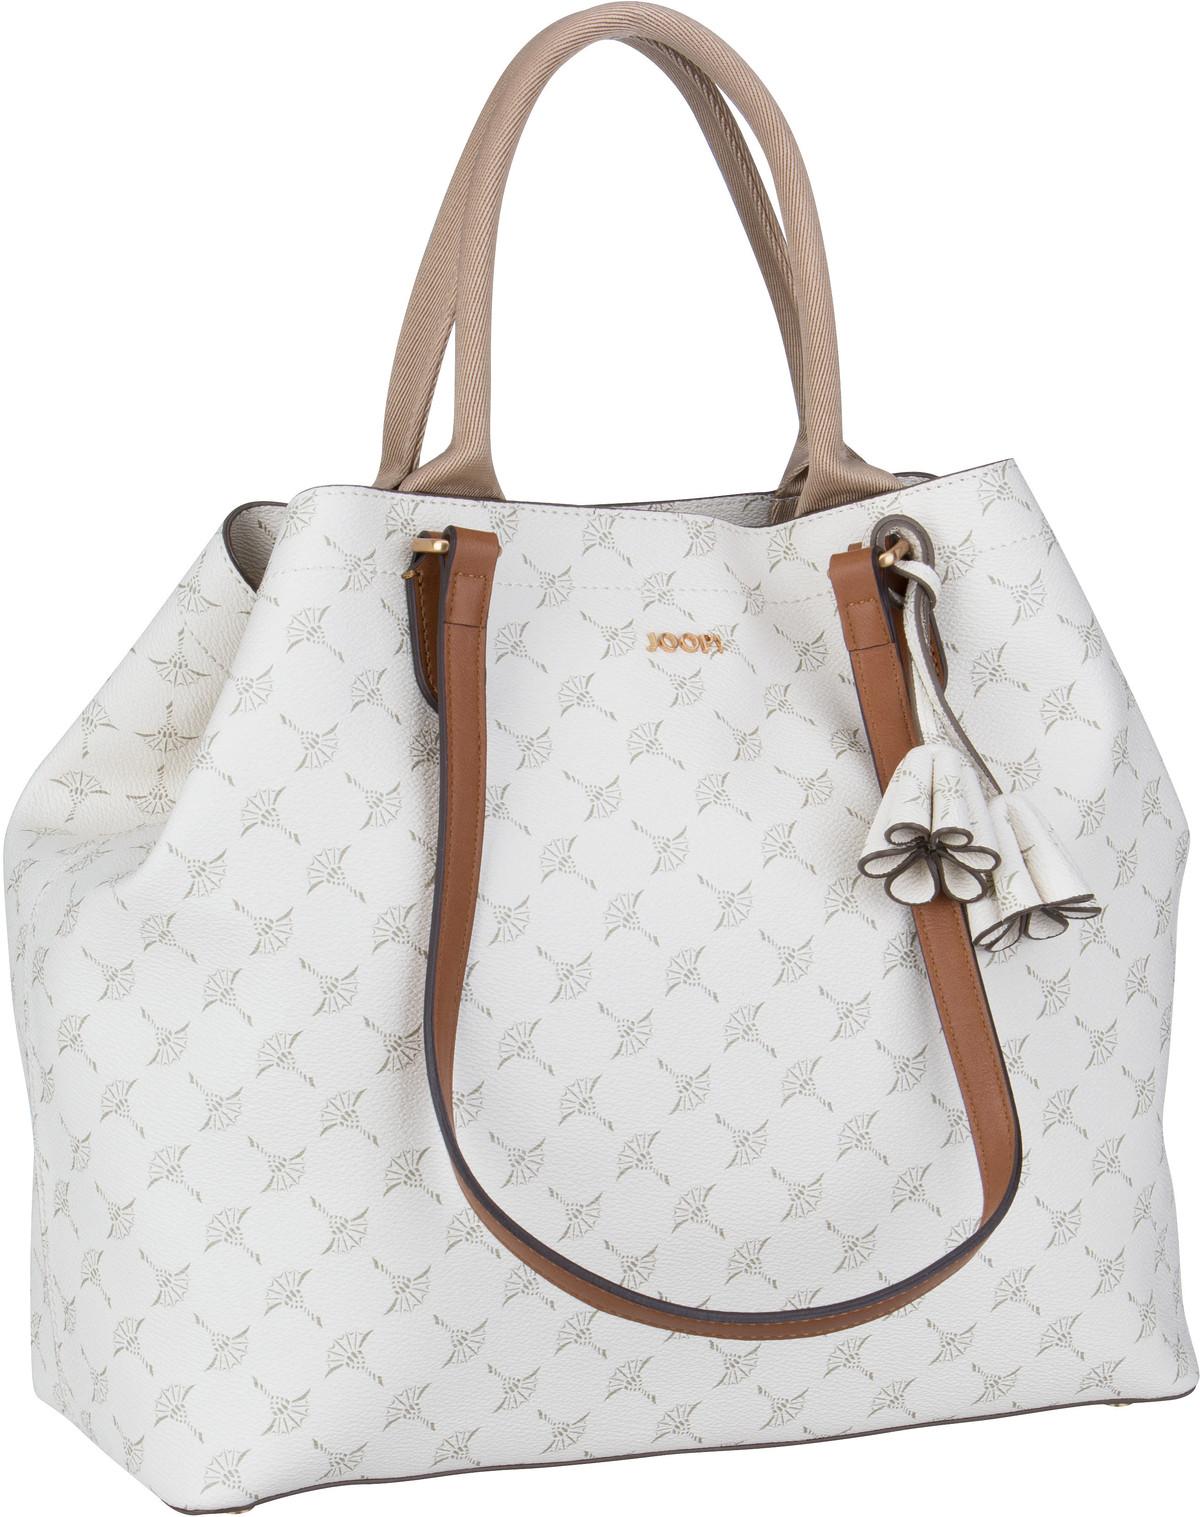 Handtasche Cortina Sara Shopper LHO Offwhite